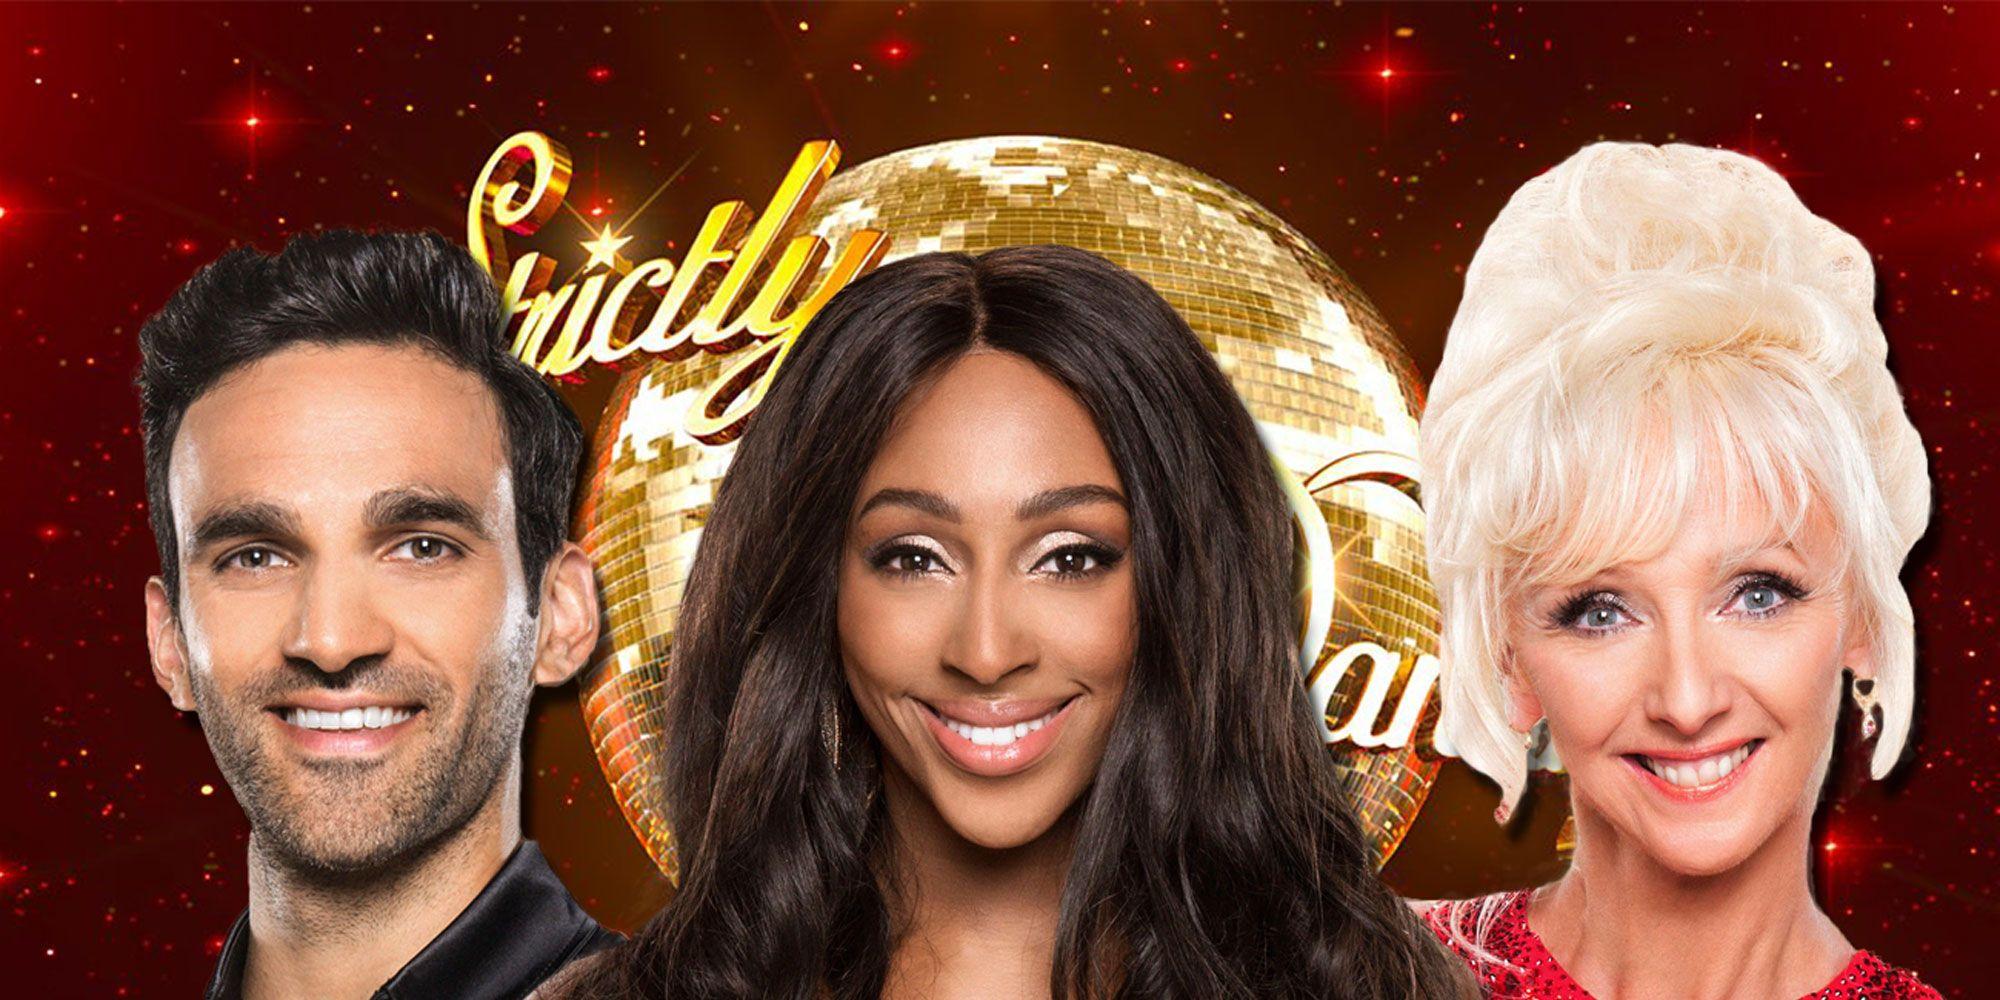 EMBARGOED until 6.45pm 11/14, Alexandra Burke, Debbie McGee, Davood Ghadami, Strictly Come Dancing